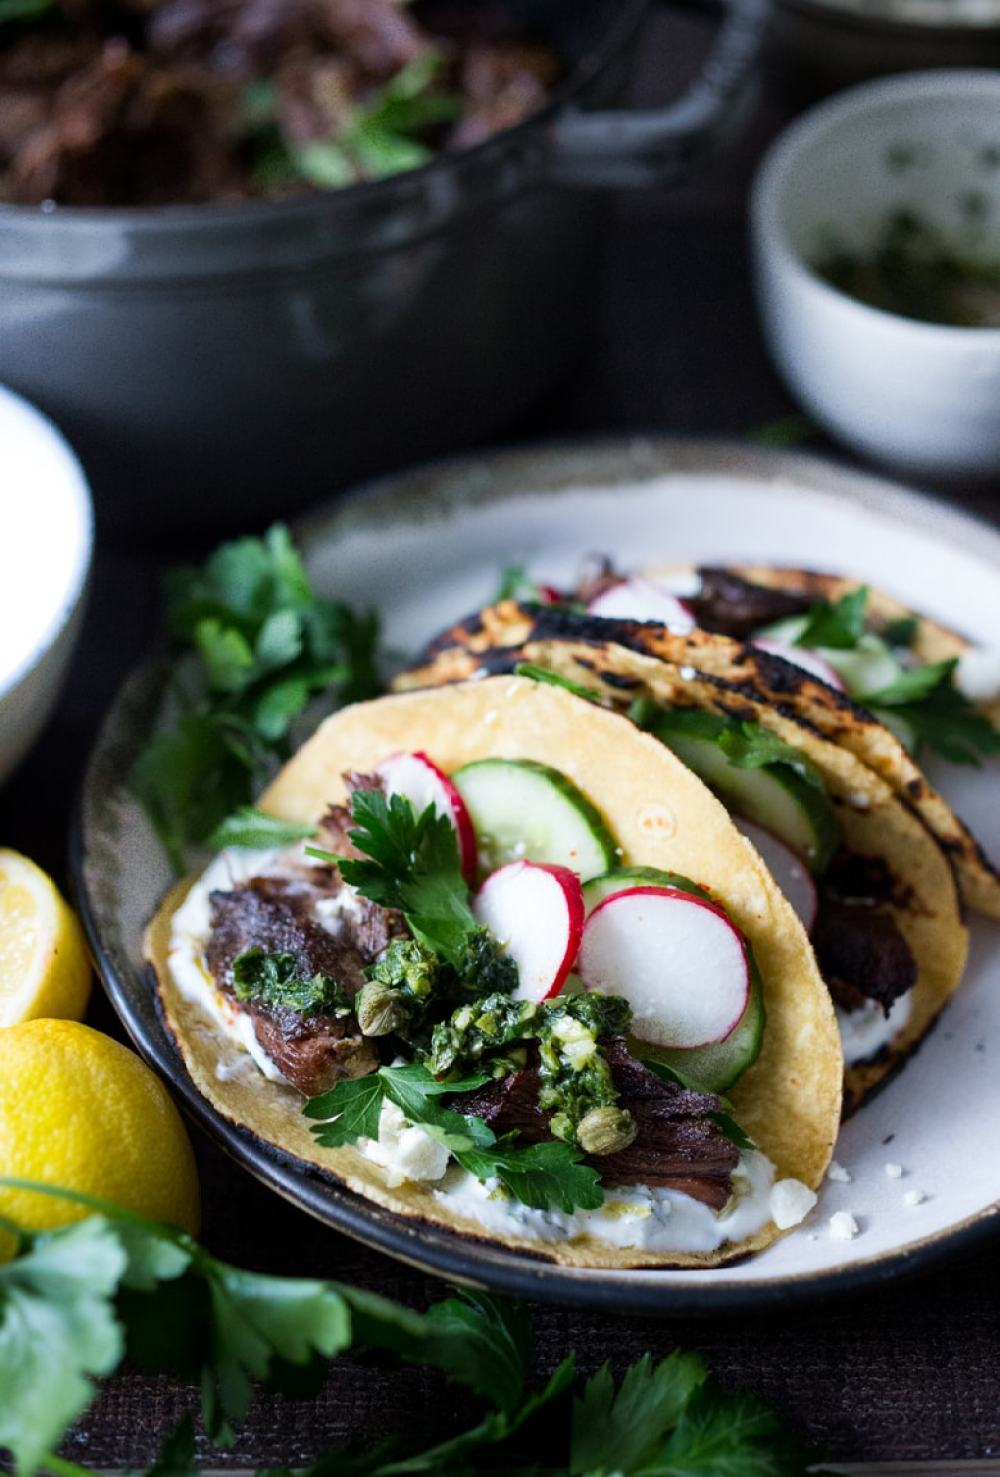 Greek Lamb Tacos with Minted Yogurt Sauce